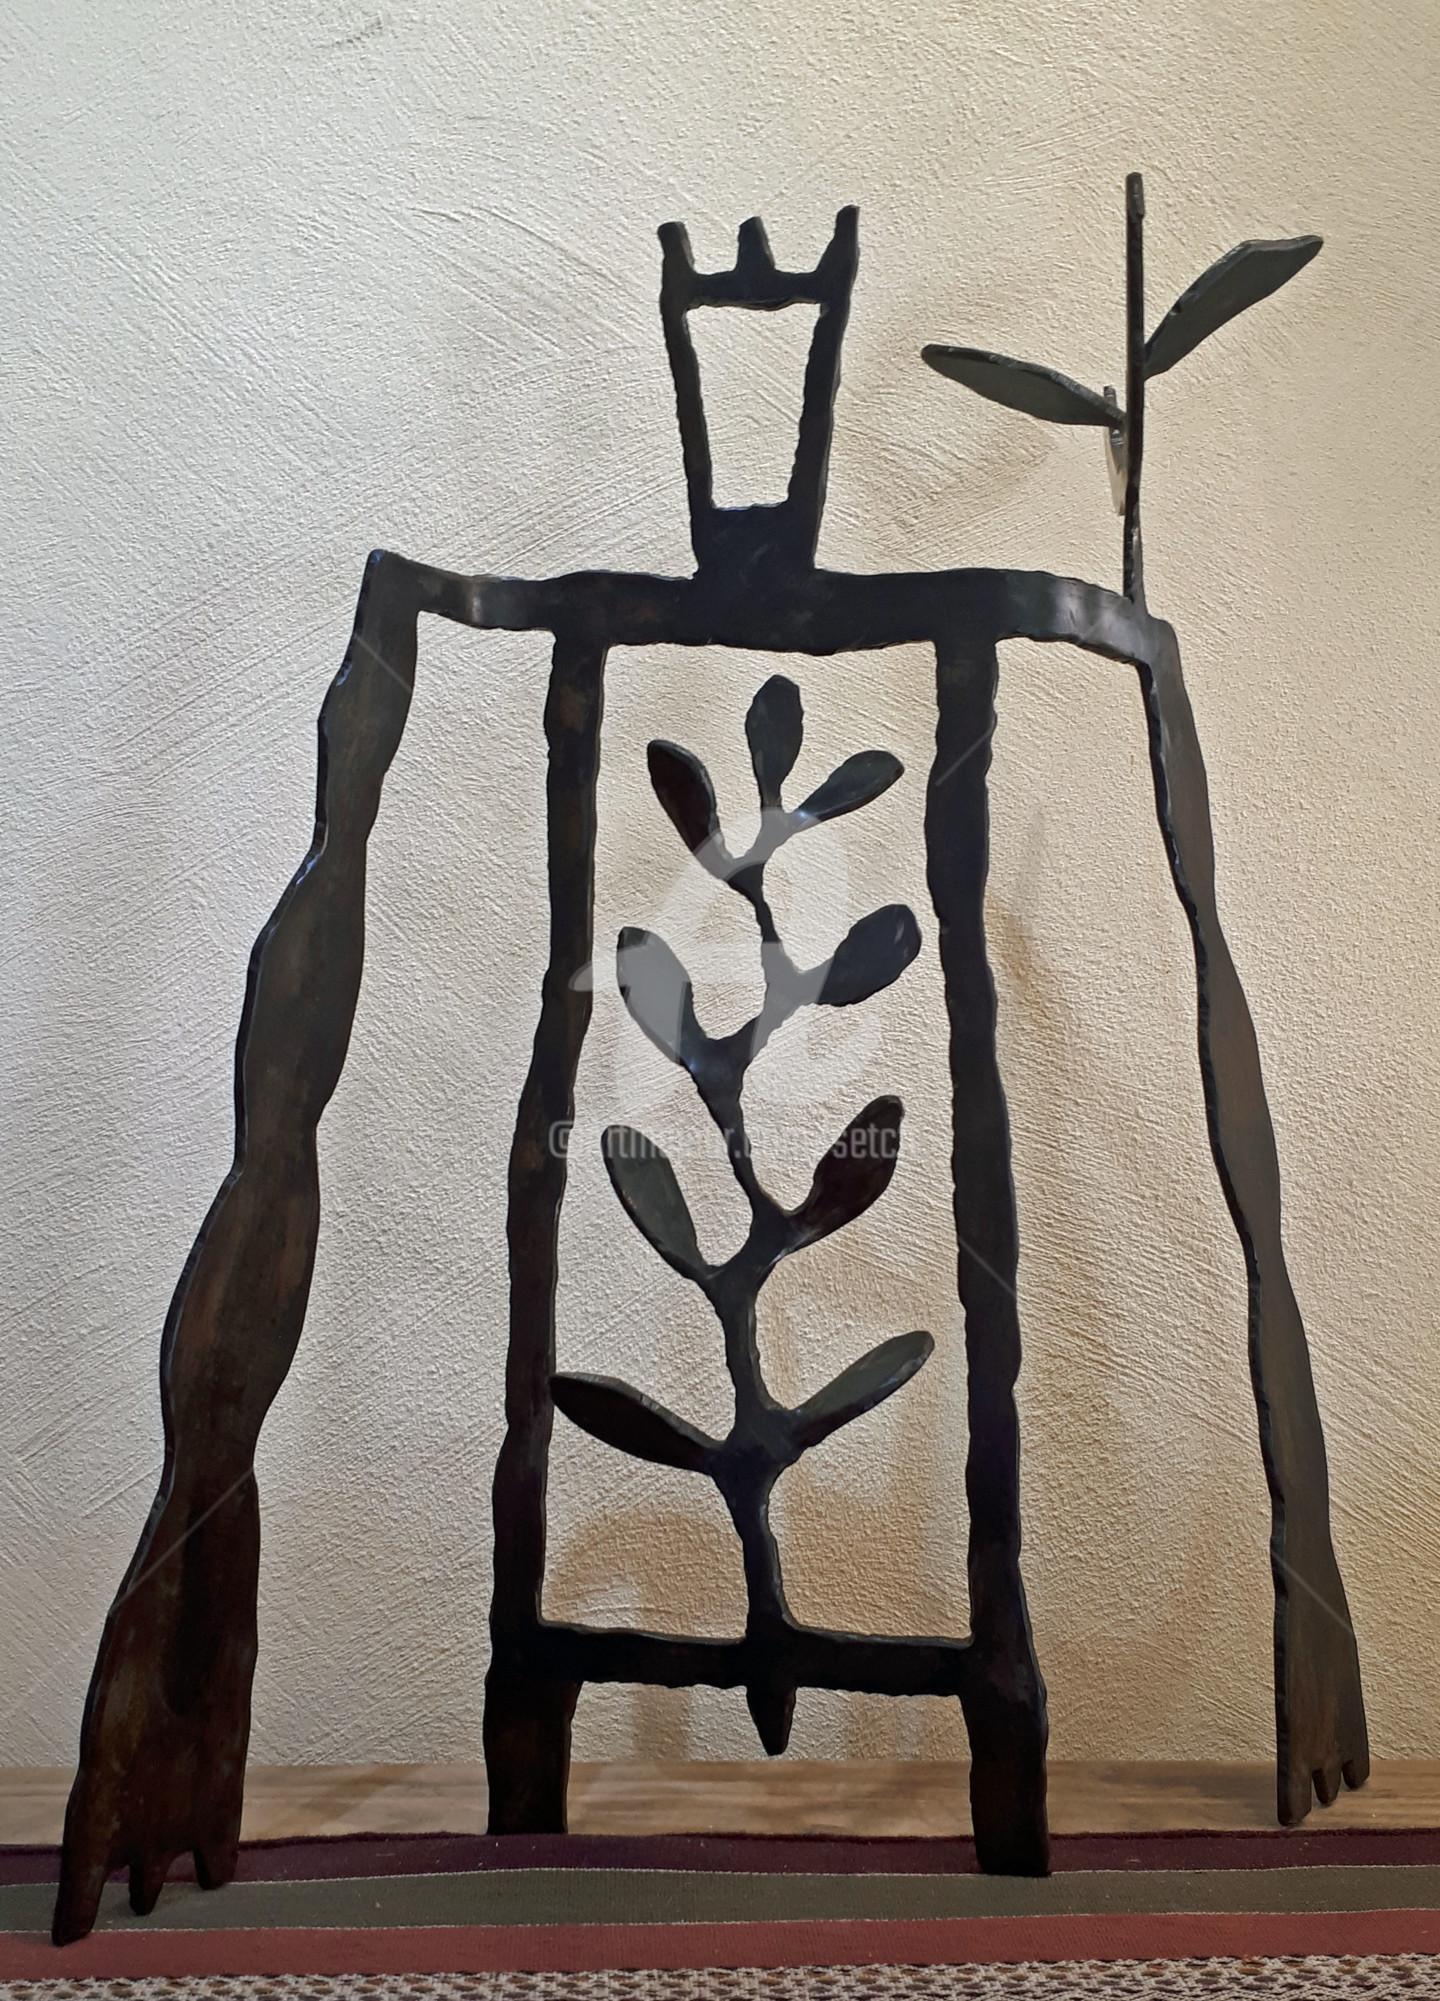 SETCH - Homme Oiseau